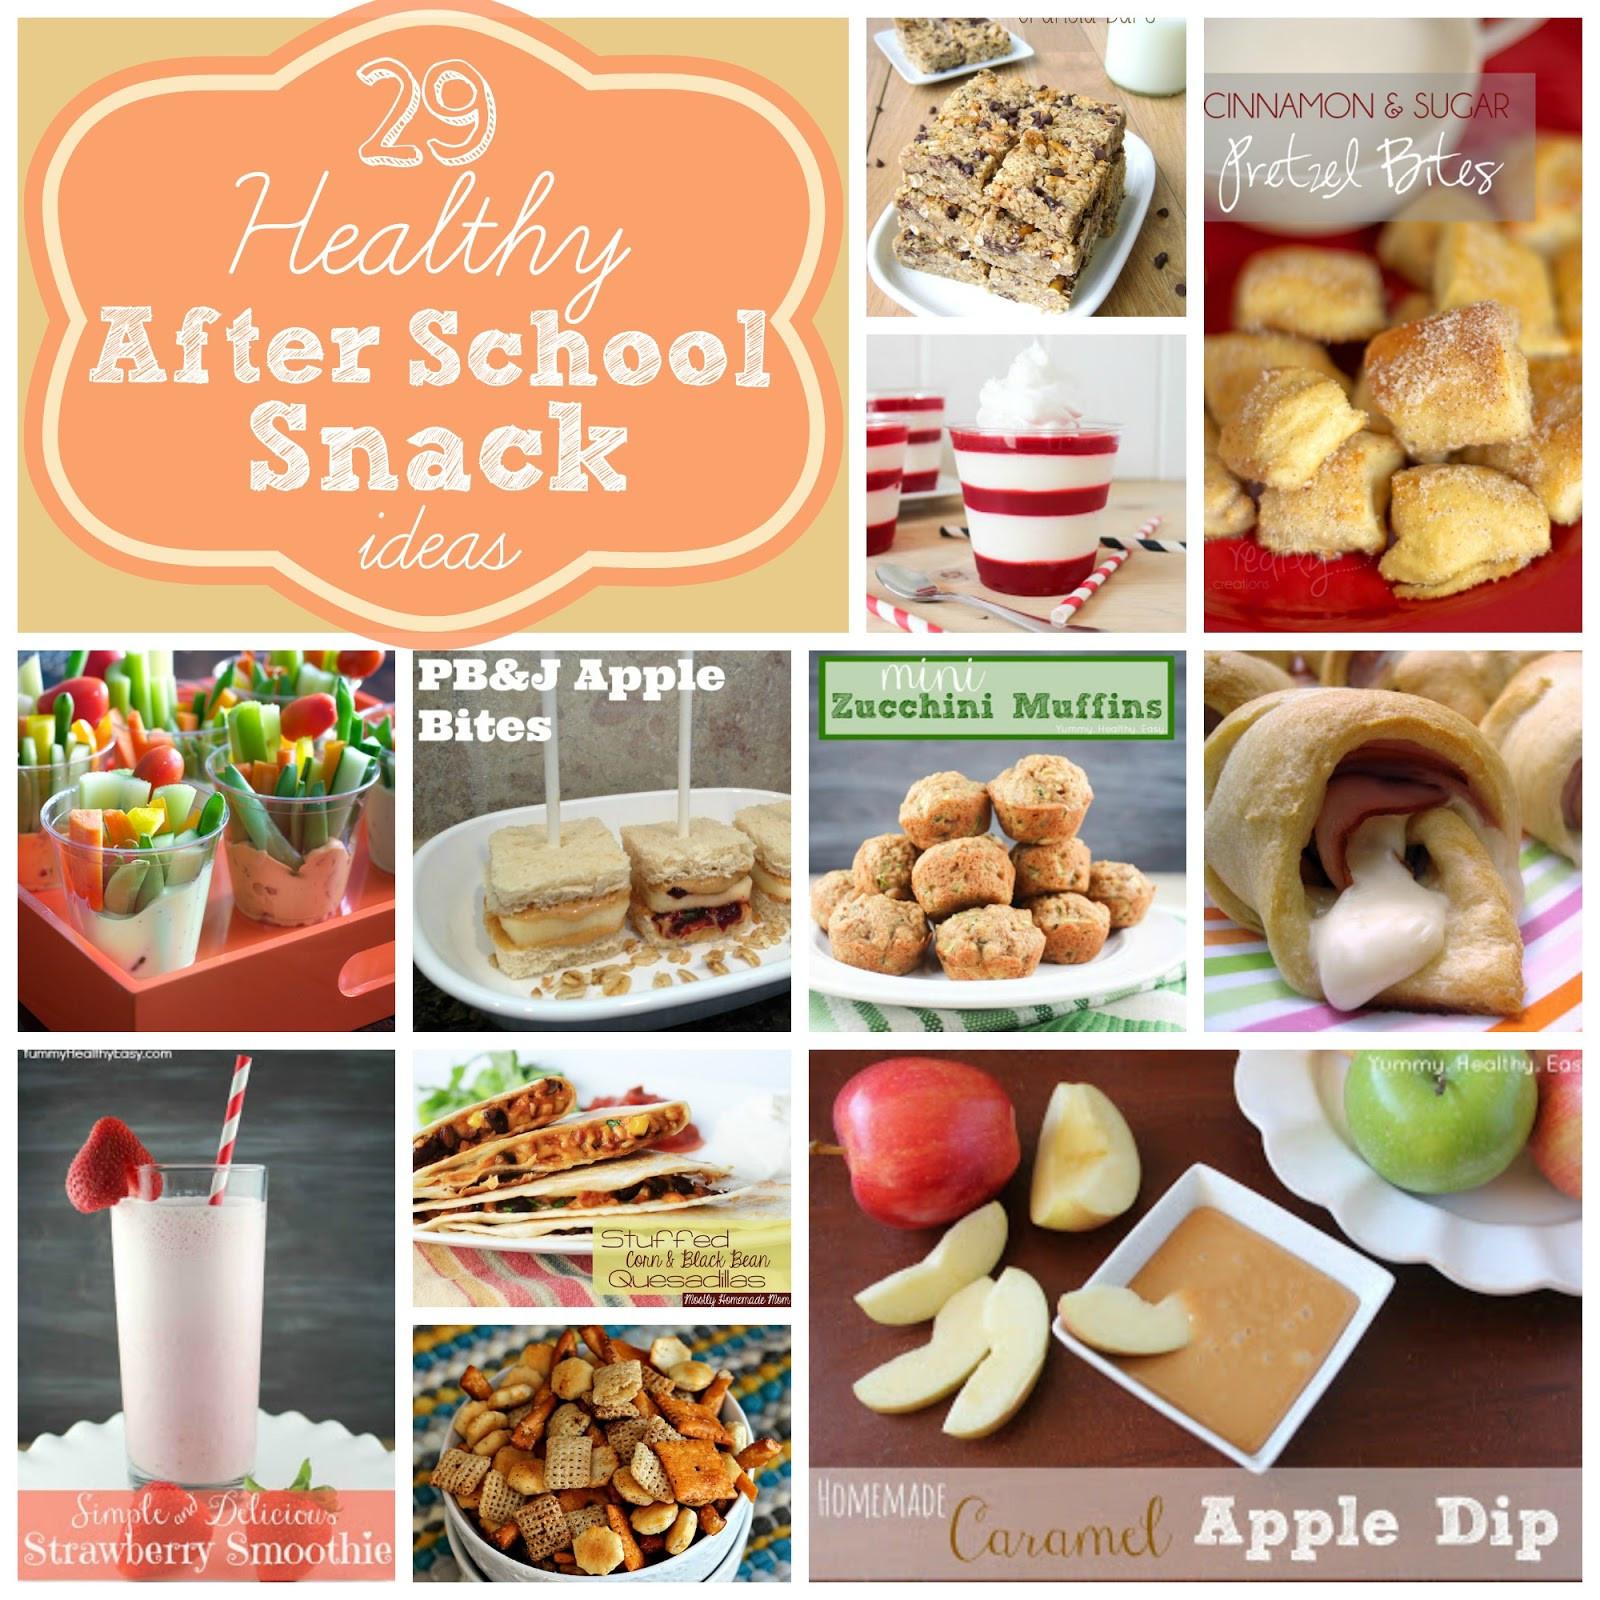 Healthy Snacks For School  29 Healthy After School Snack Ideas Yummy Healthy Easy